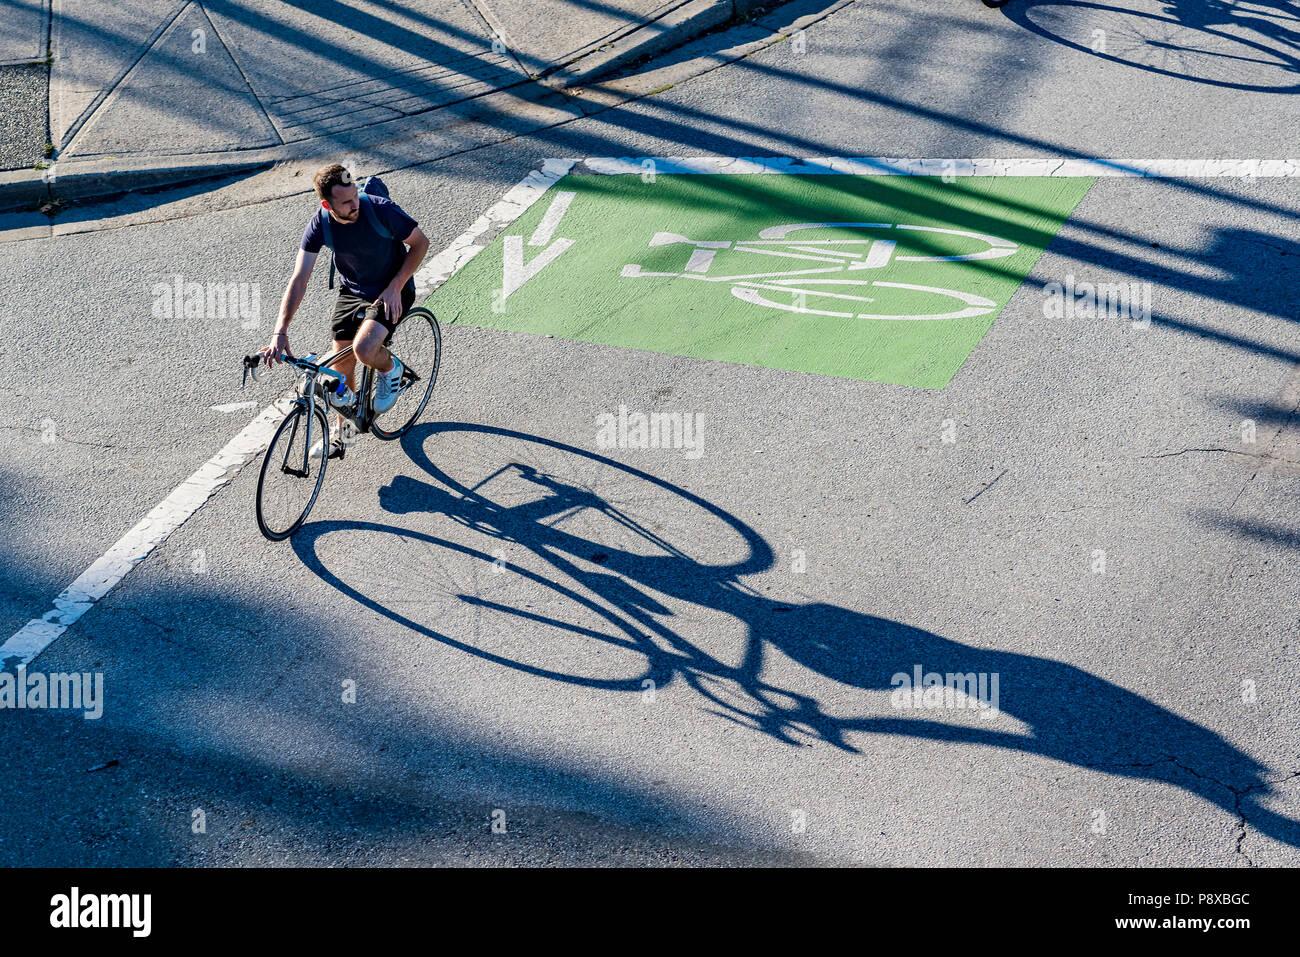 Cyclist using dedicated bike lane, Vancouver, British Columbia, Canada. Stock Photo